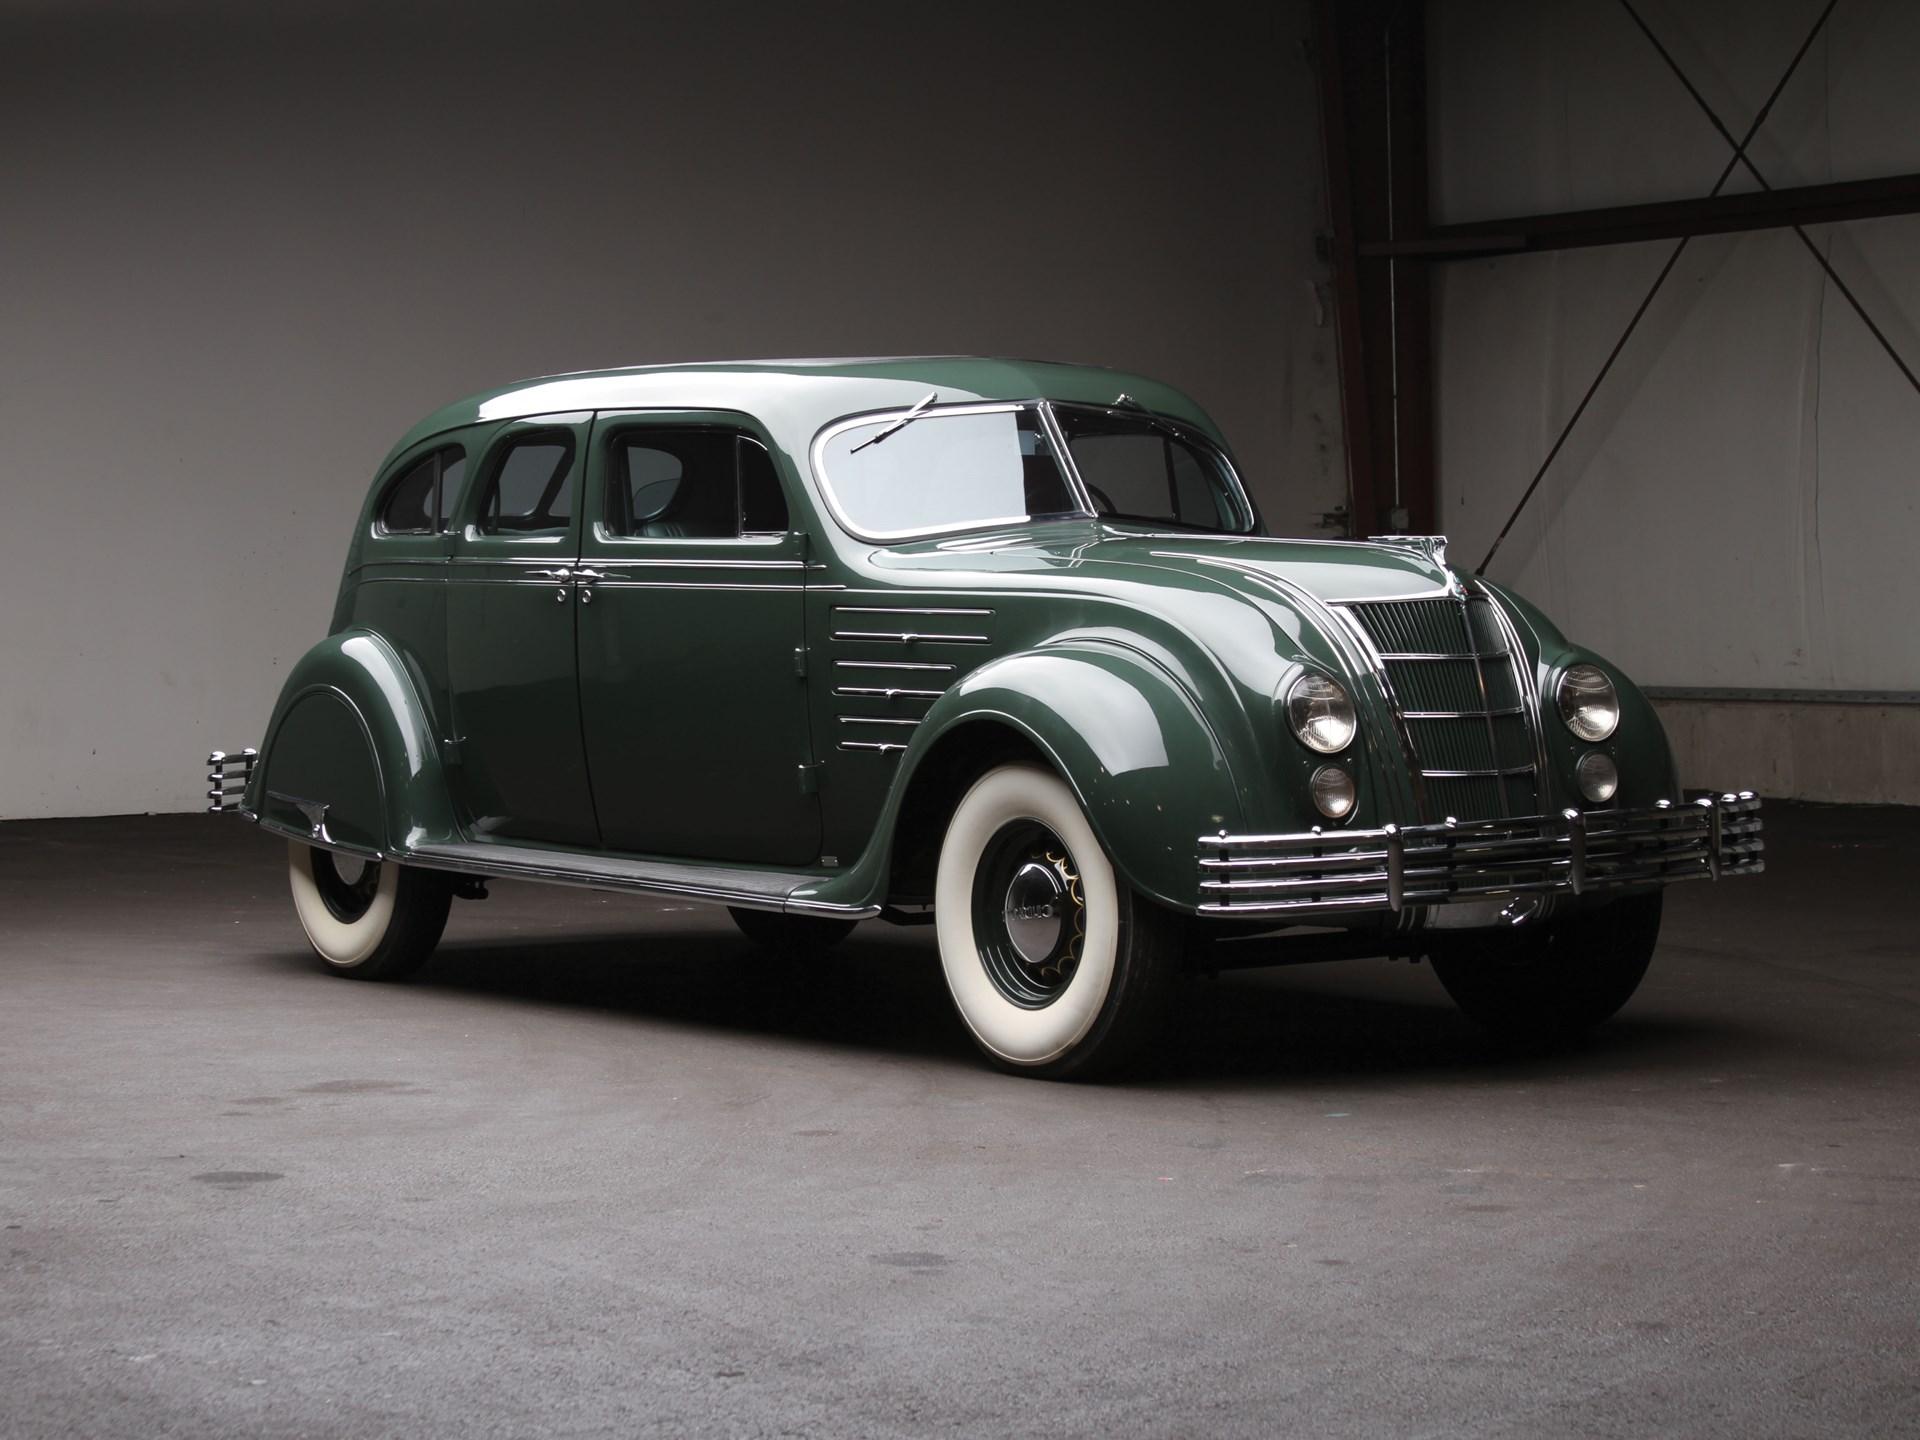 RM Sotheby's - 1934 Chrysler Custom Imperial Airflow   Auburn Spring